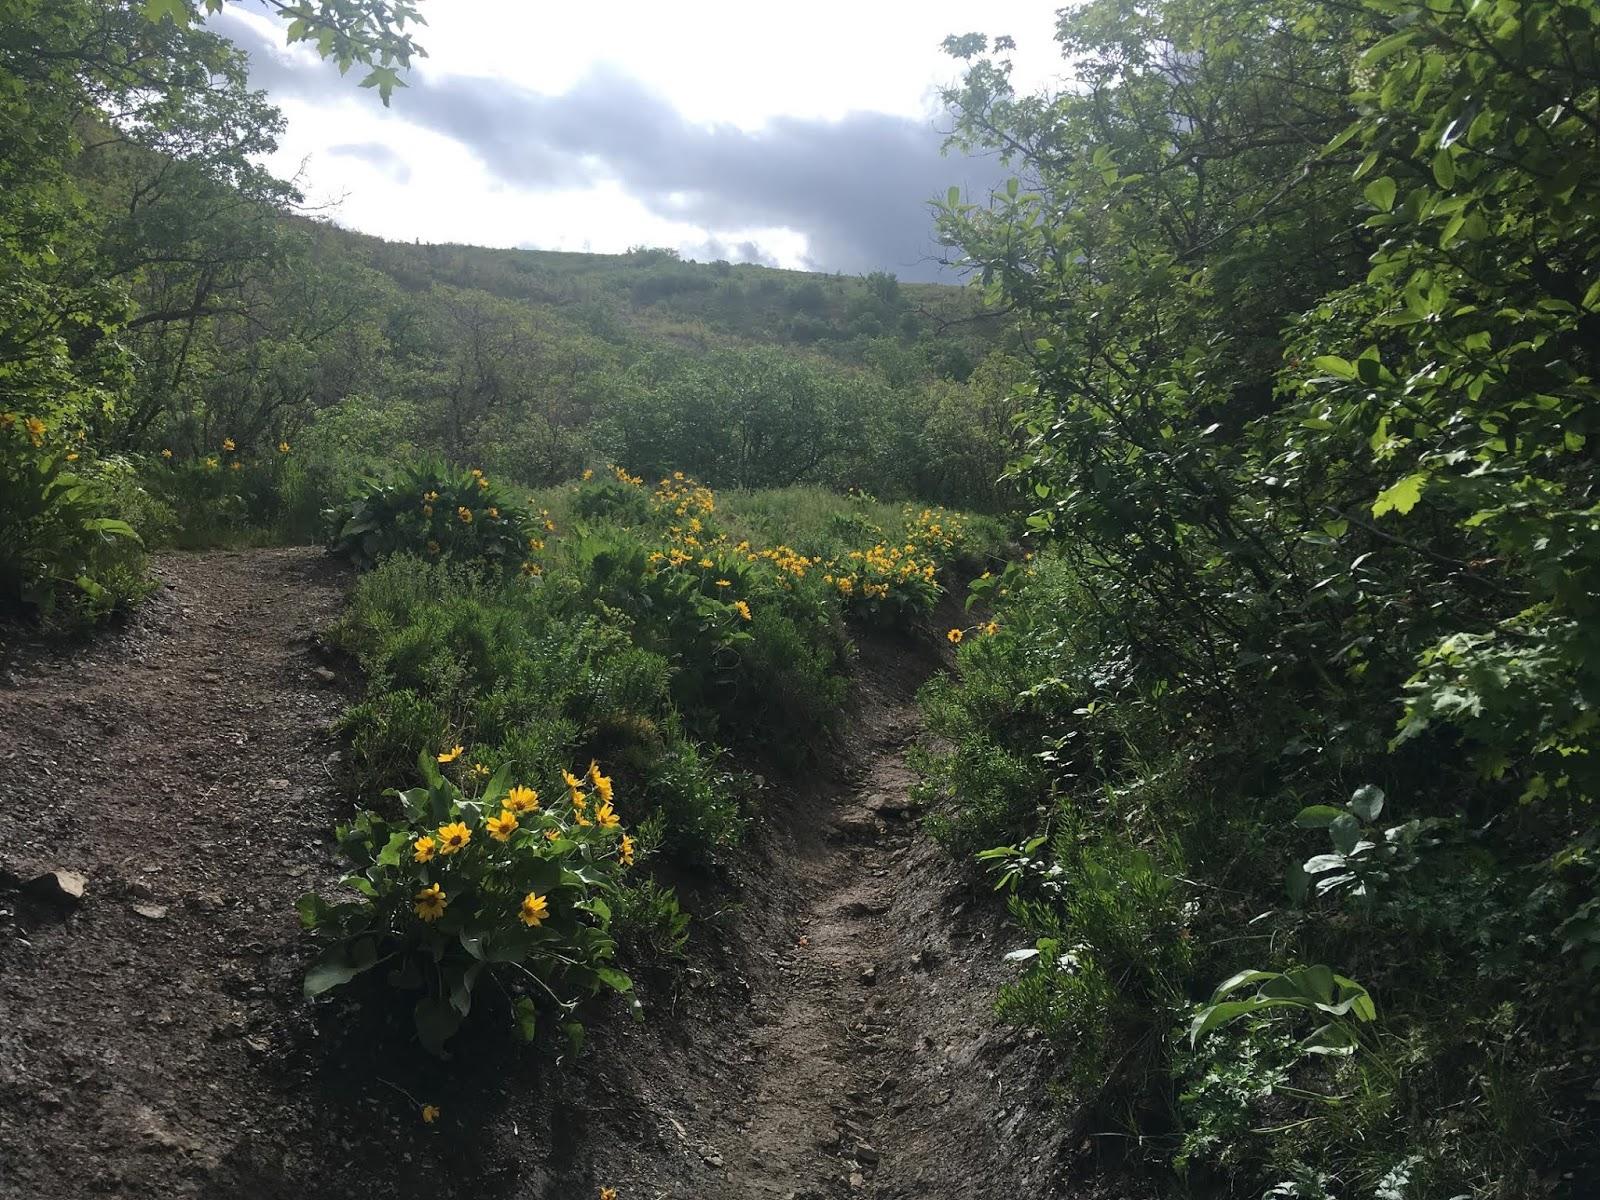 Hiking to Mt. Wire, Salt Lake City, Utah, Hiking in Utah with Dogs